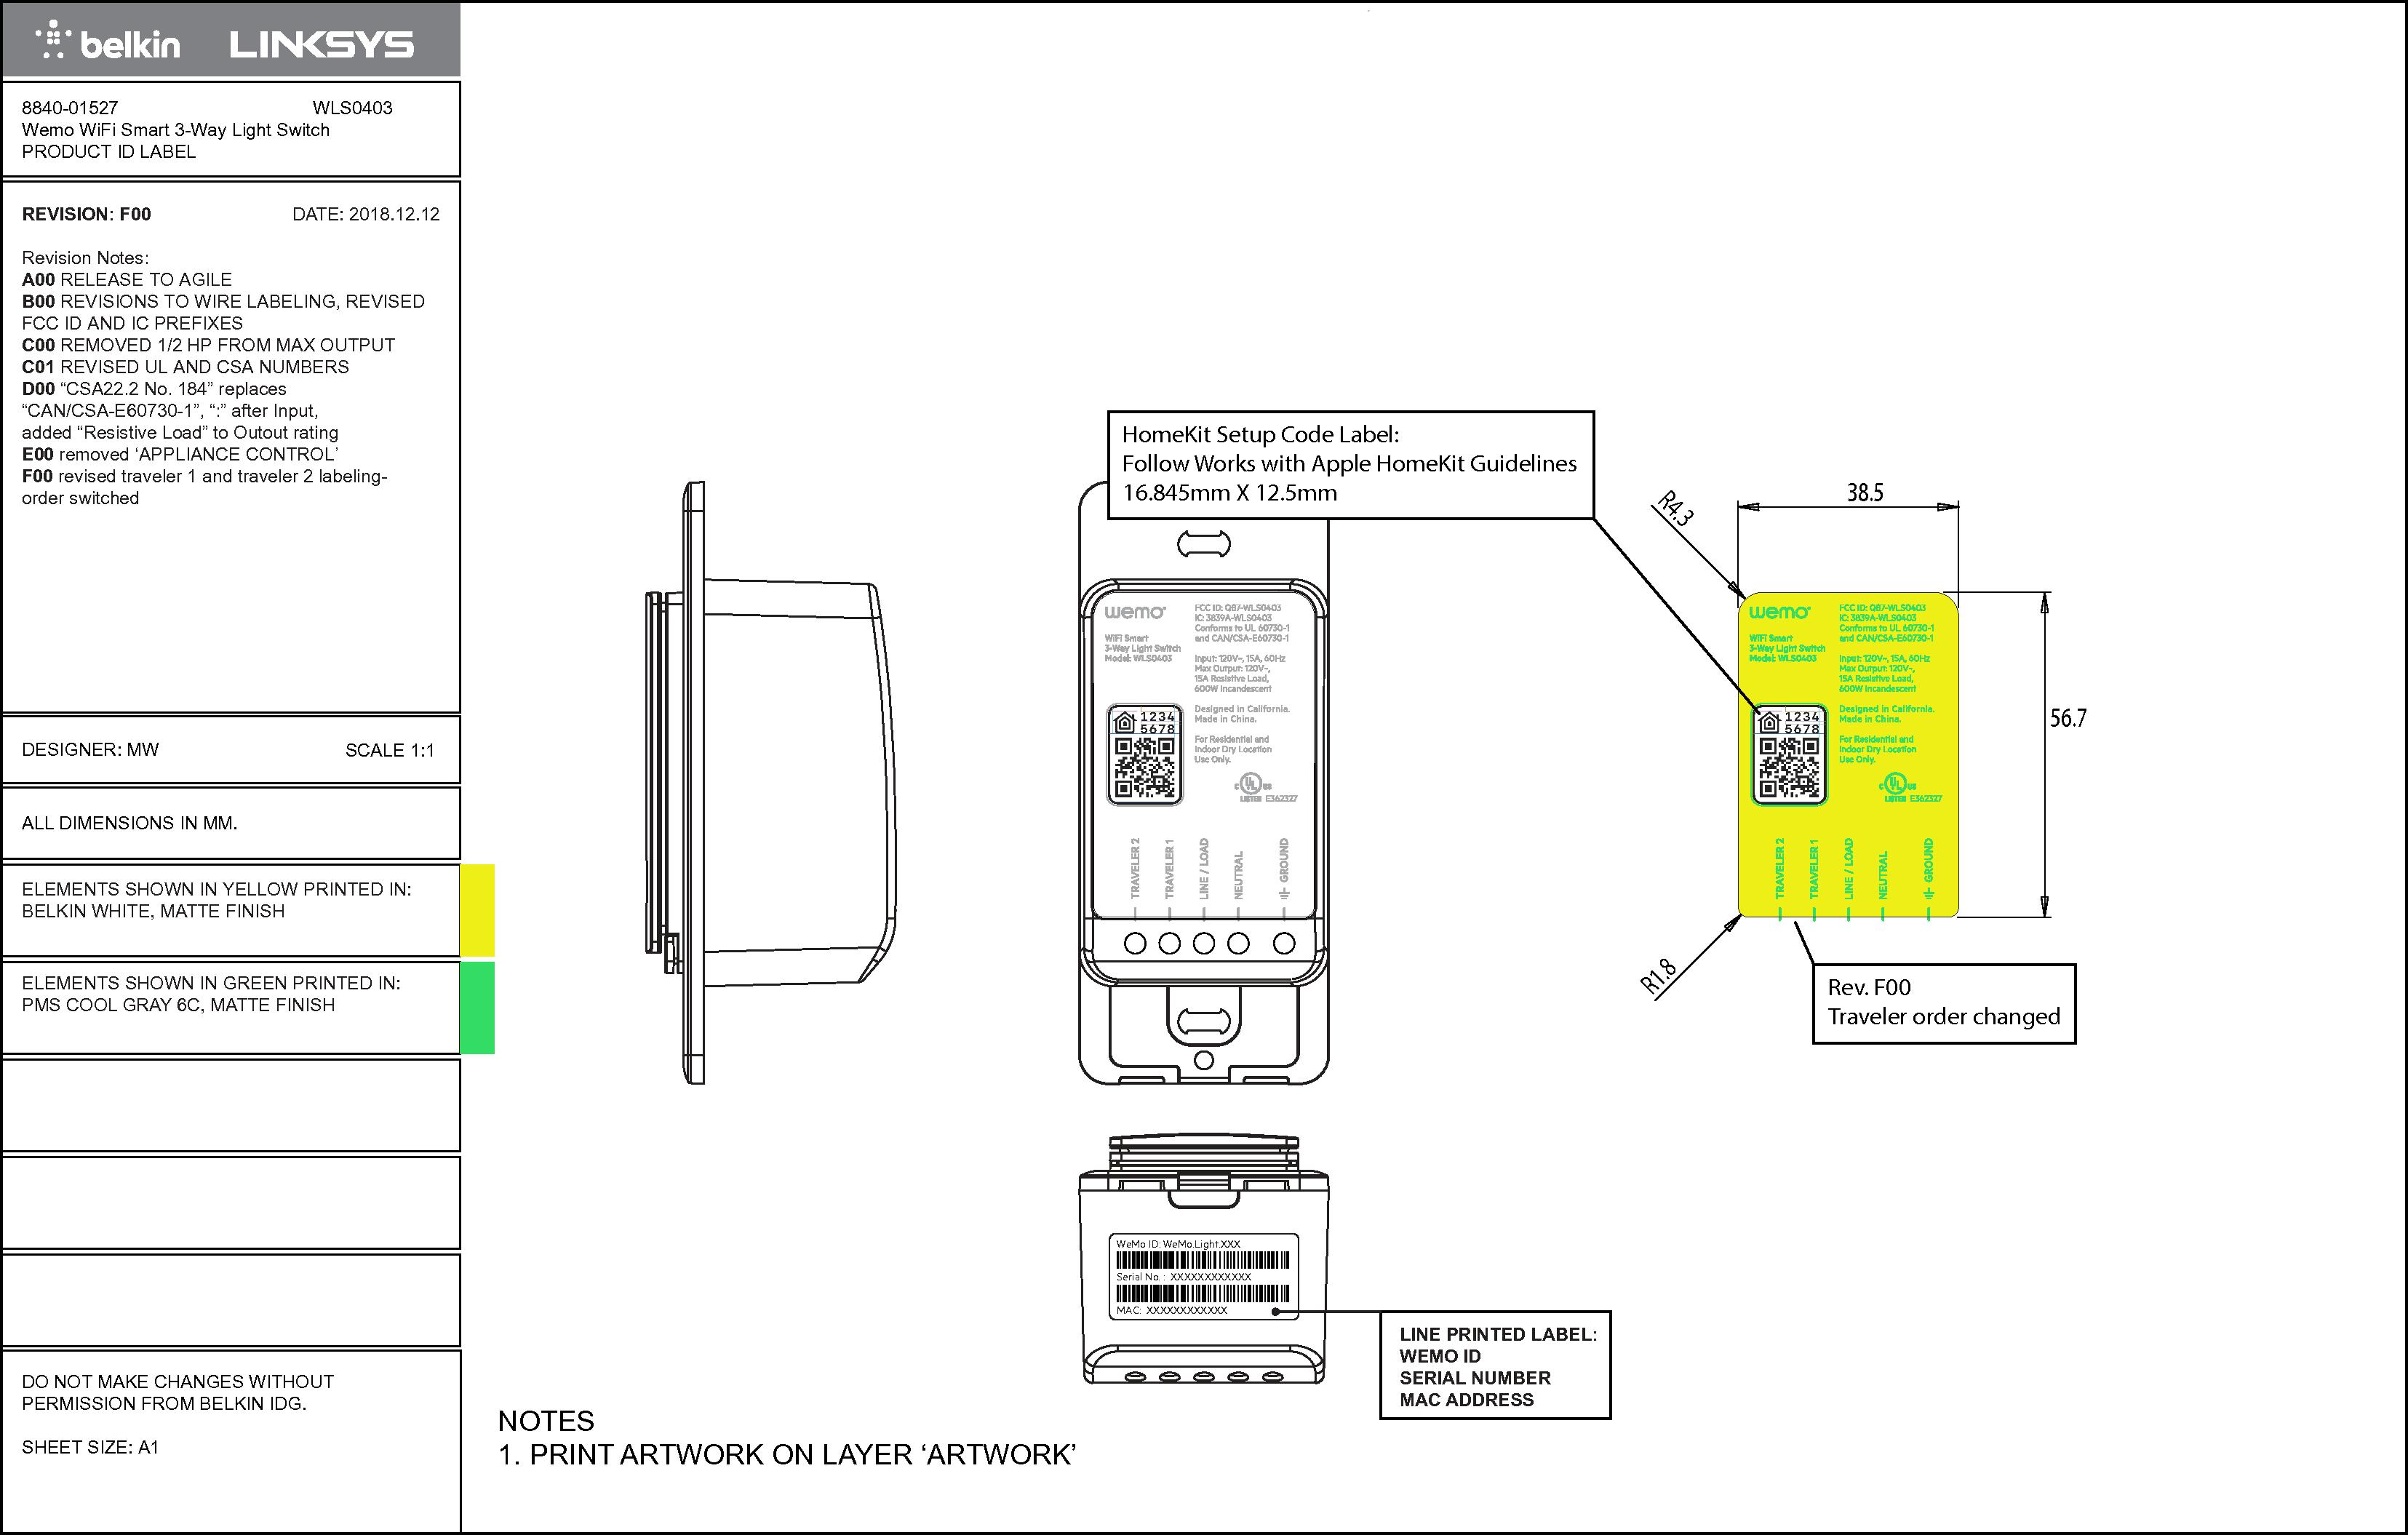 $CSCO LINKSYS LLC WiFi Smart 3-Way Light Switch WLS0403